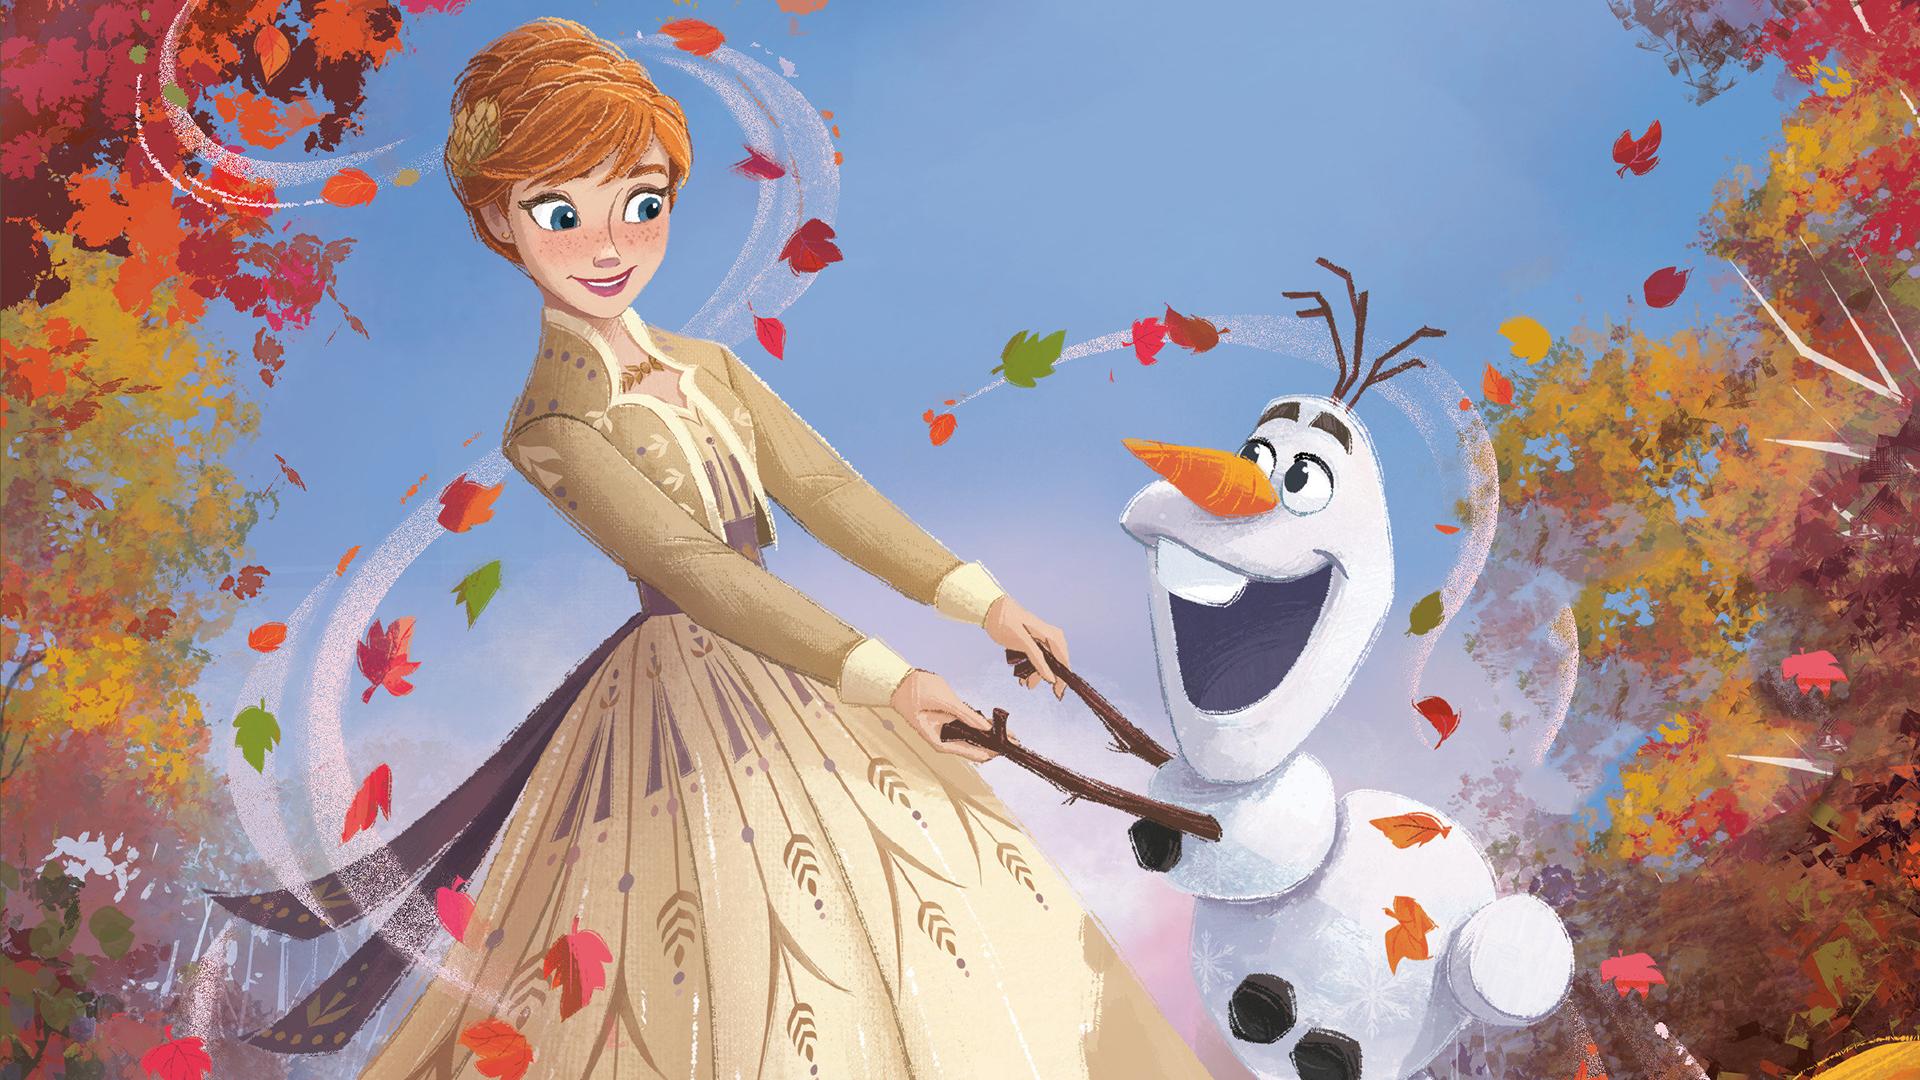 Frozen 2 Desktop Hd Wallpapers Youloveitcom